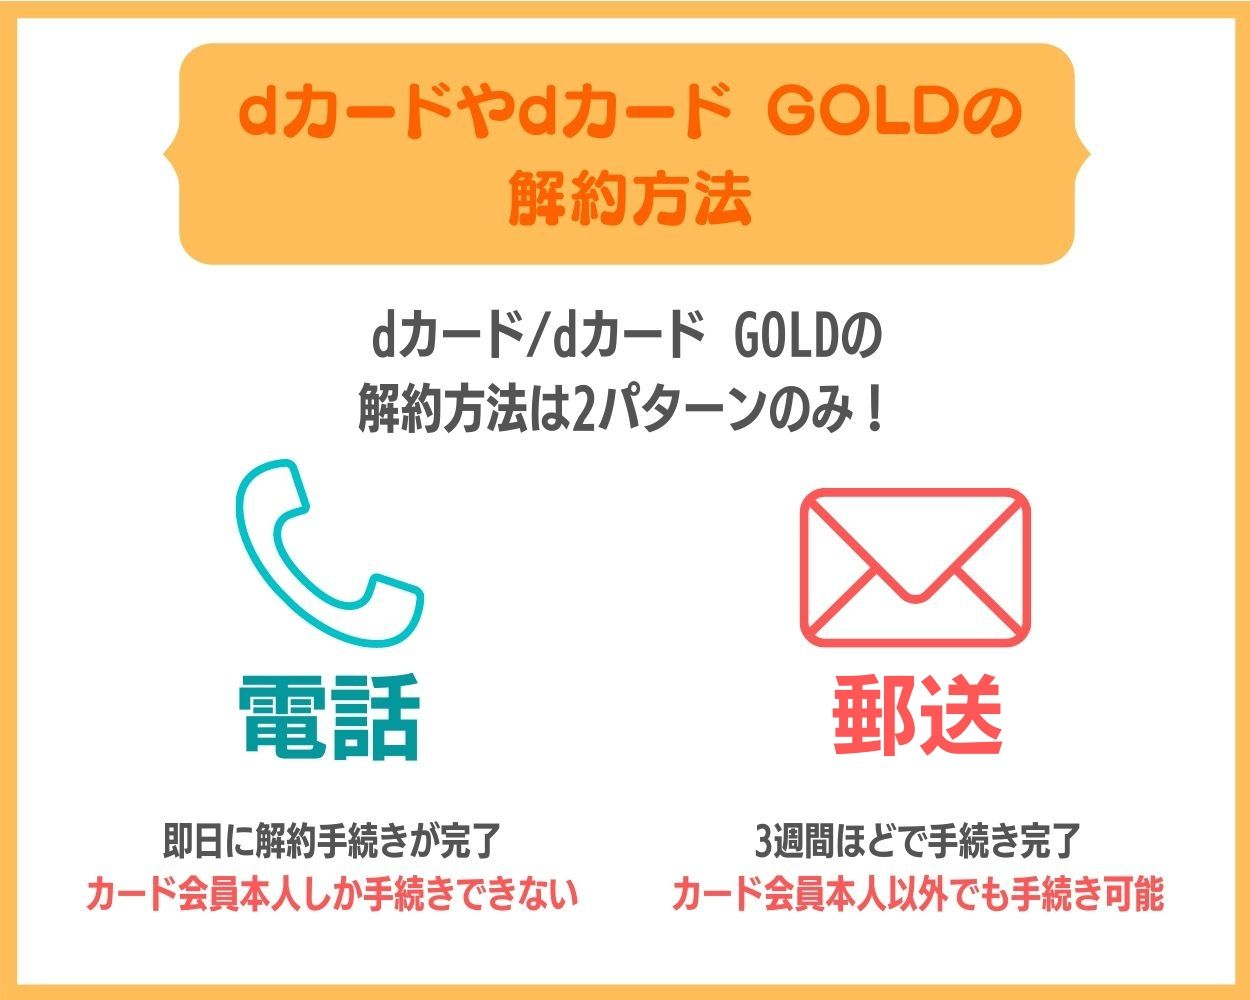 dカードやdカード GOLDの解約方法は電話or郵送のみ!